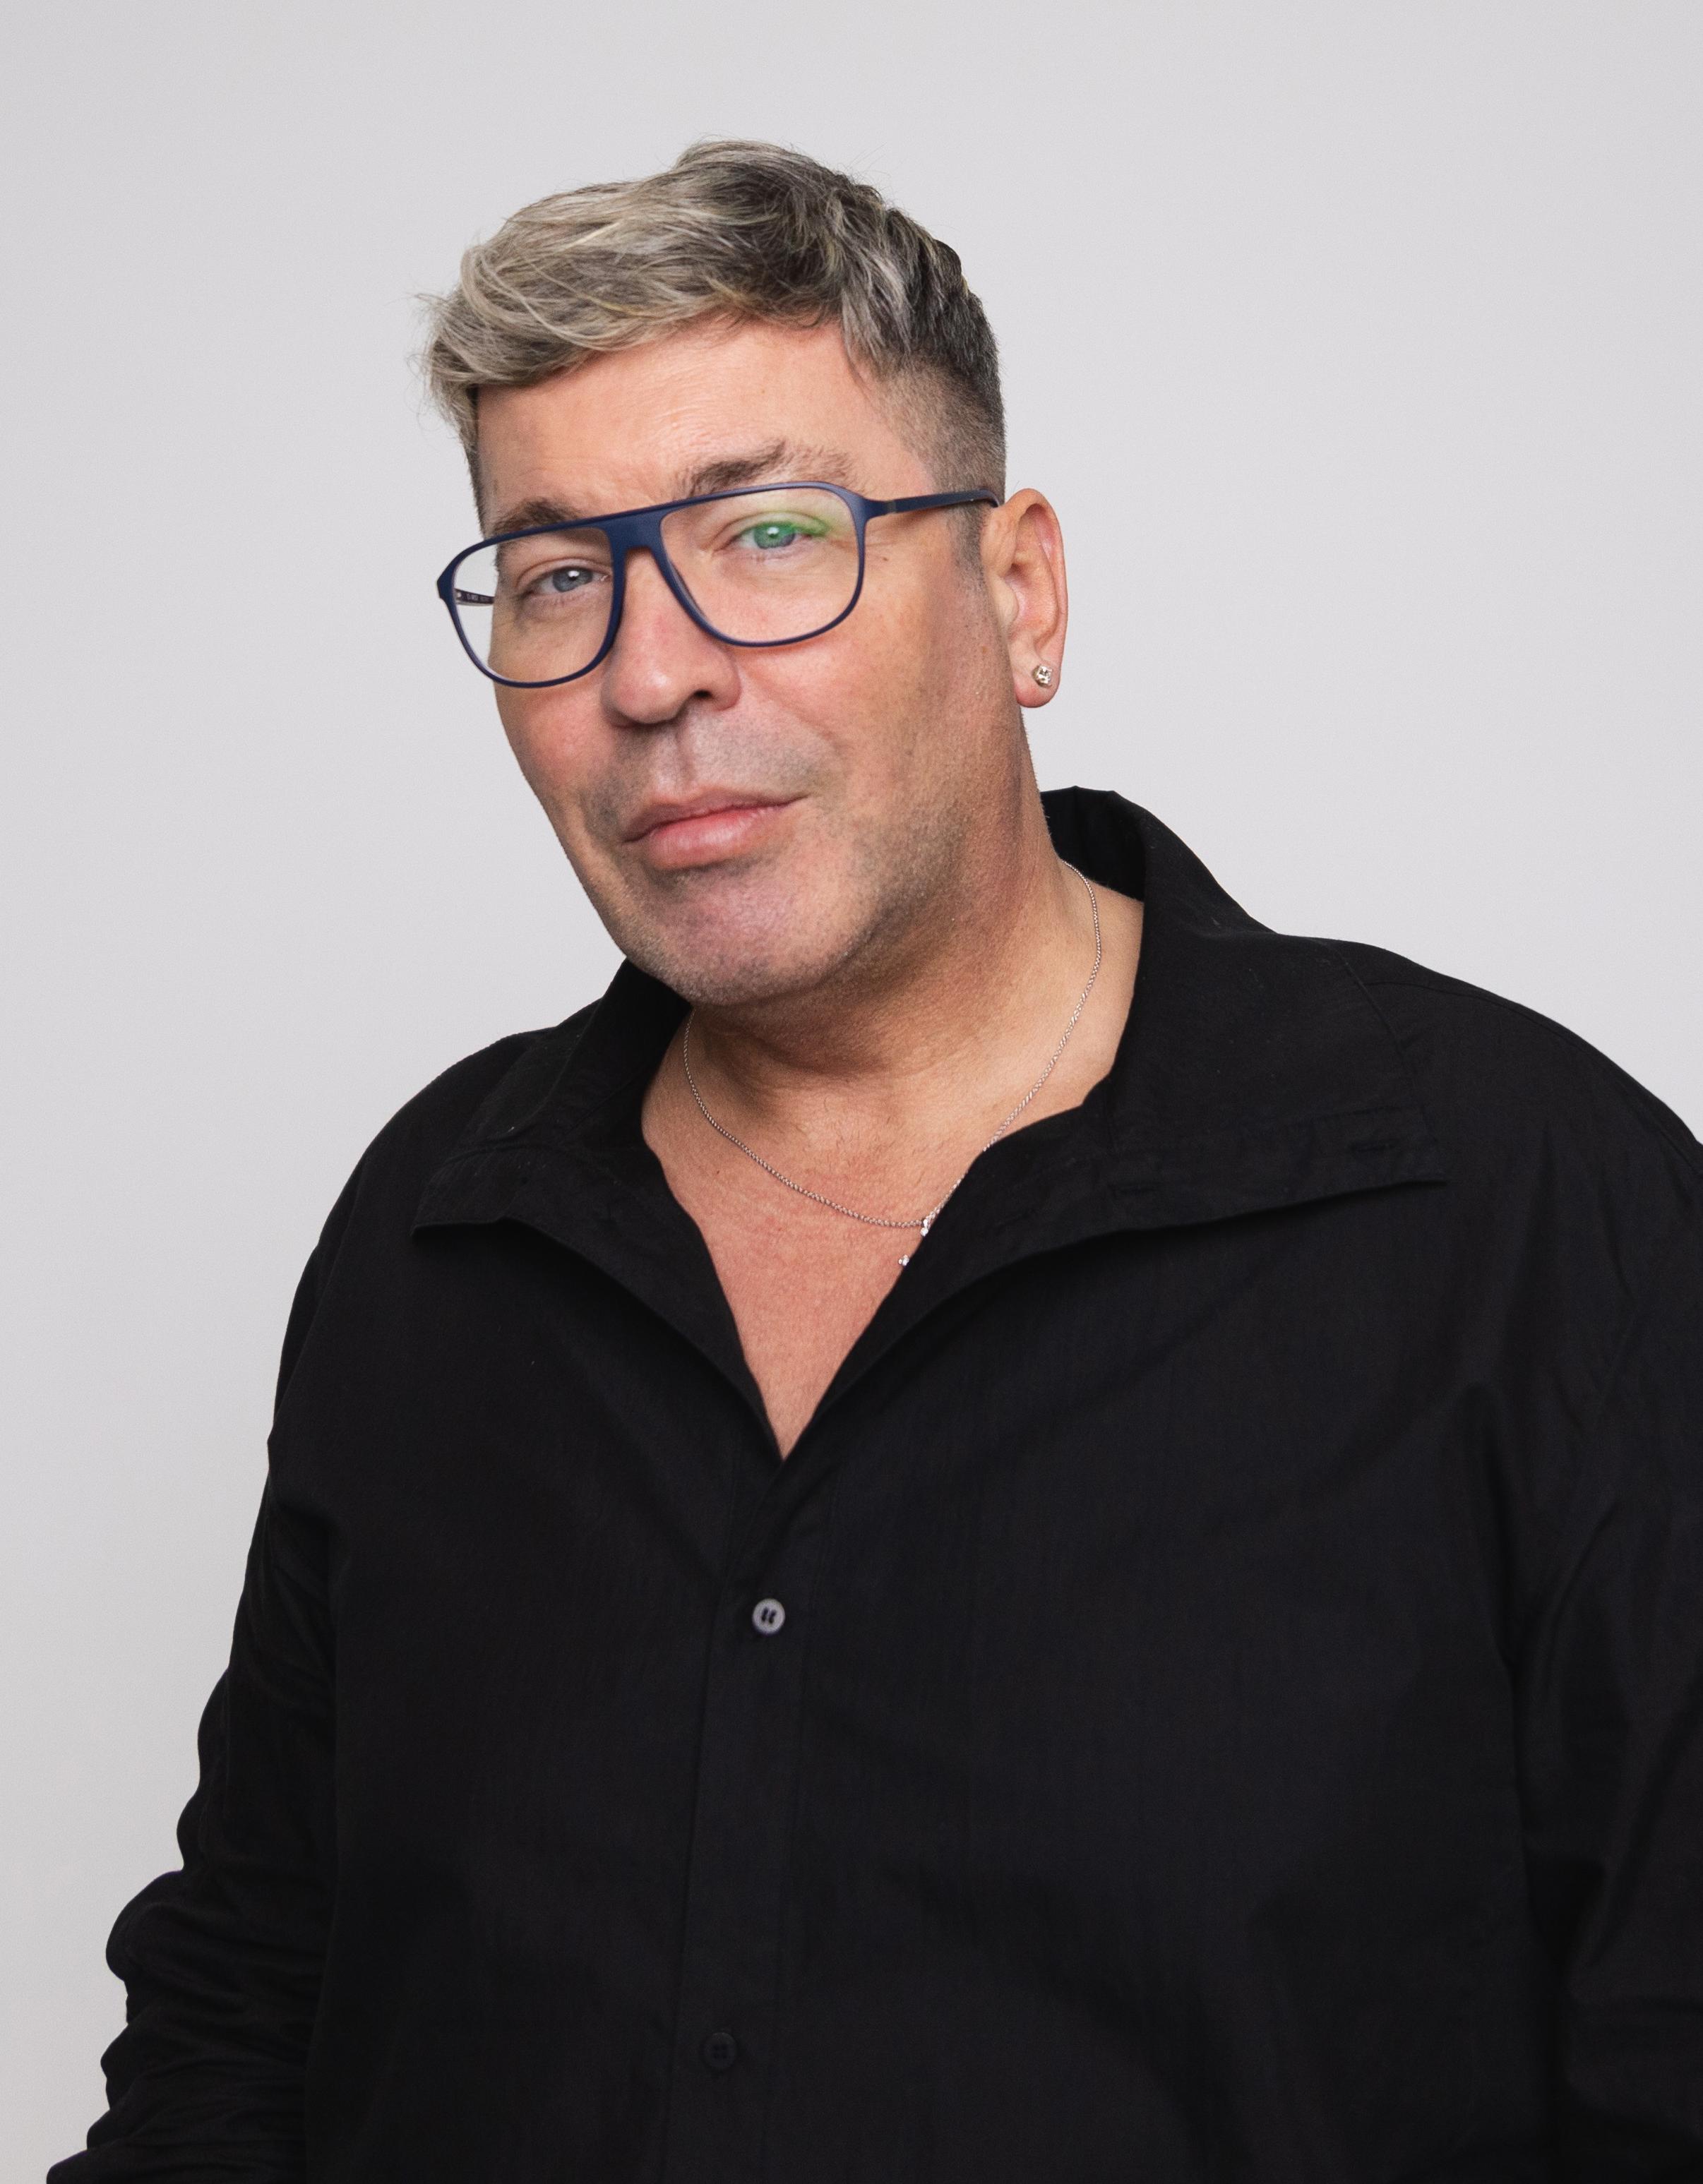 Blonding Expertise: Schwarzkopf Professional Welcomes Renowned Colorist, Jack Howard, as Global BLONDME Brand